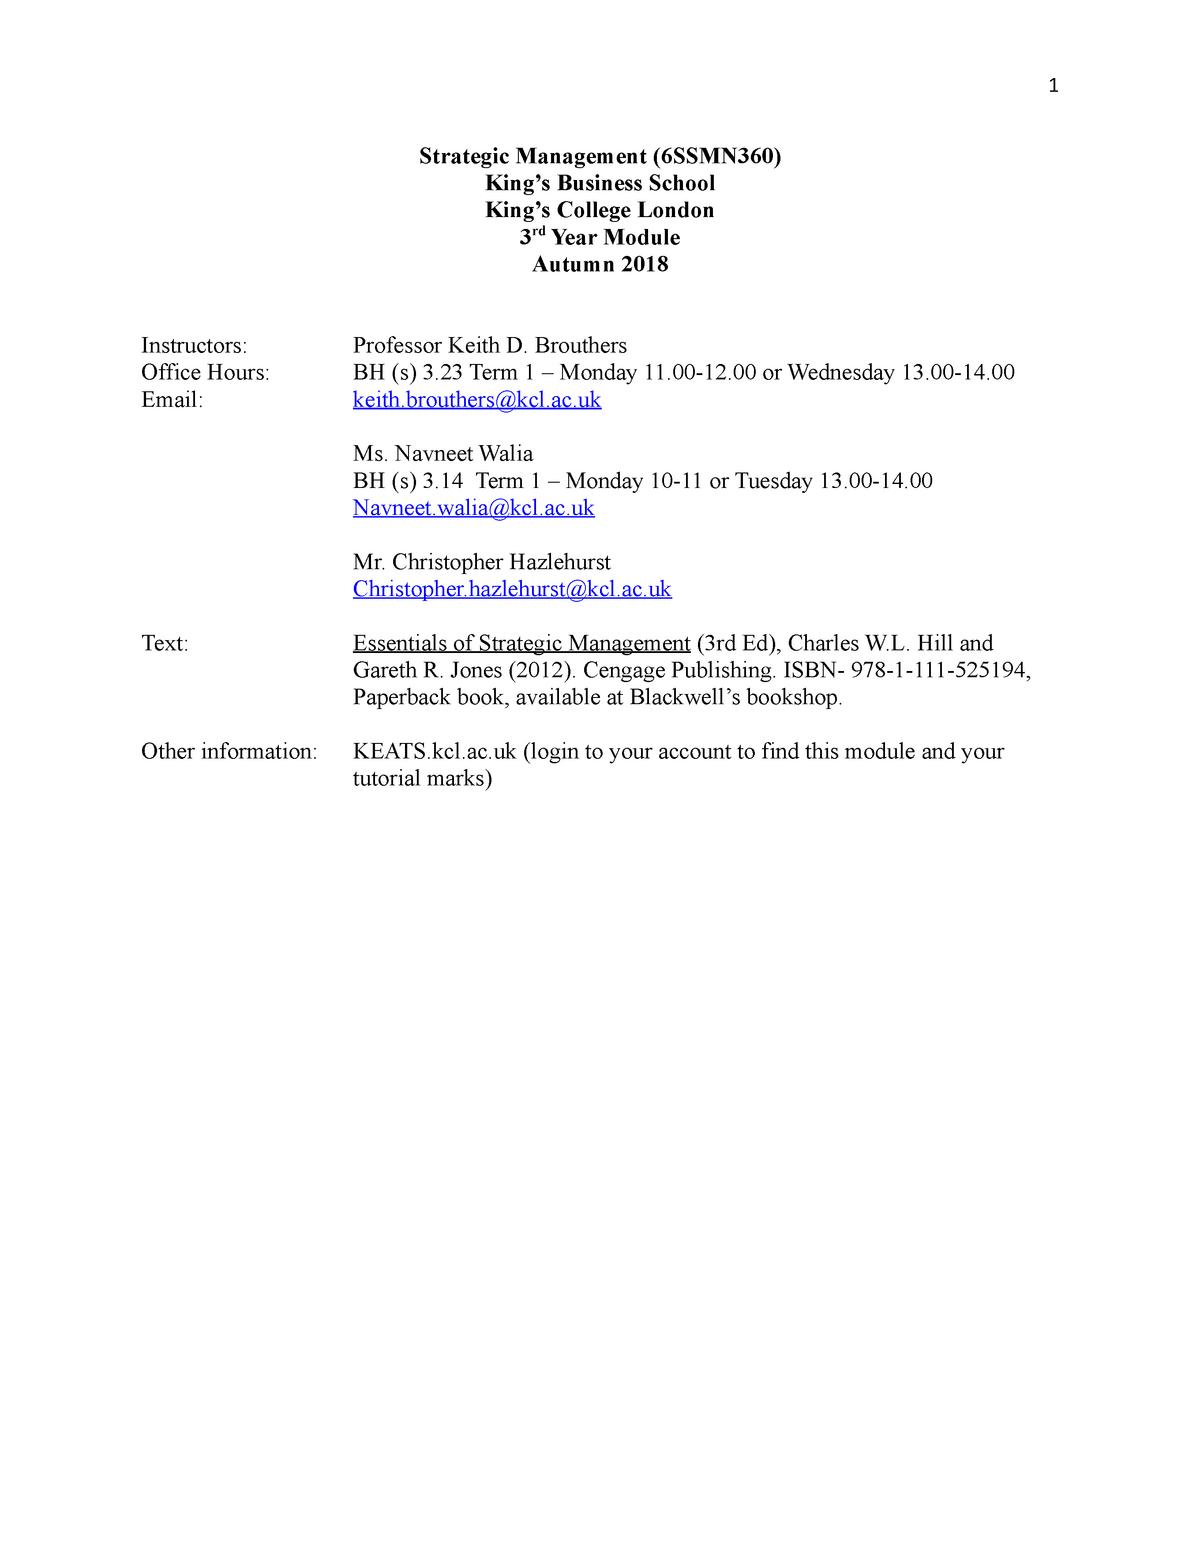 Ed Jones Login >> Module Syllabus 4zss0028 Strategic Management Studocu